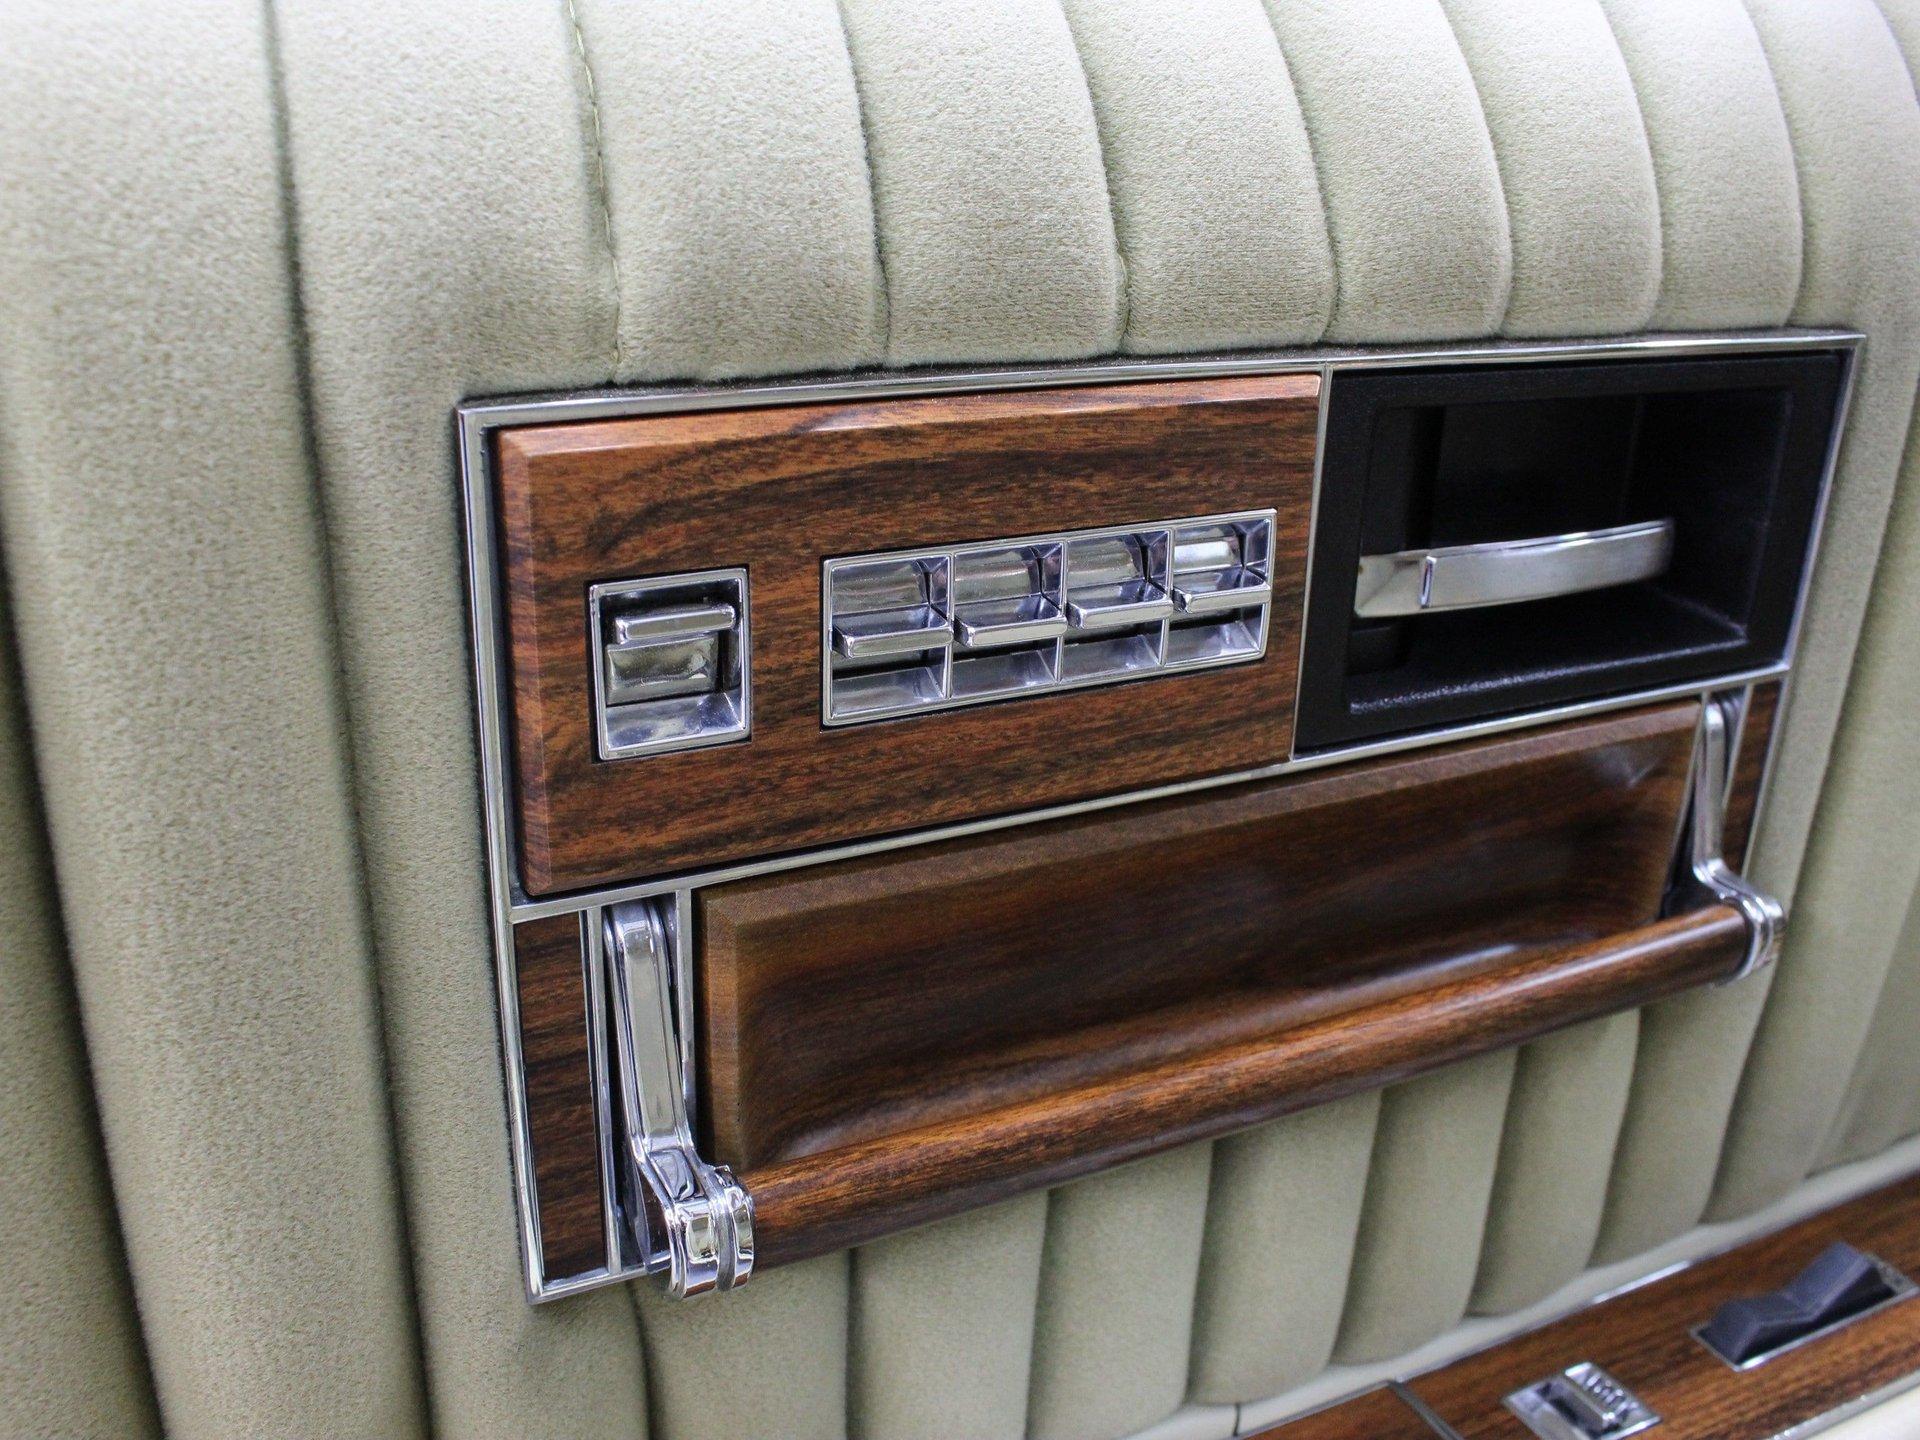 1976 Cadillac Seville